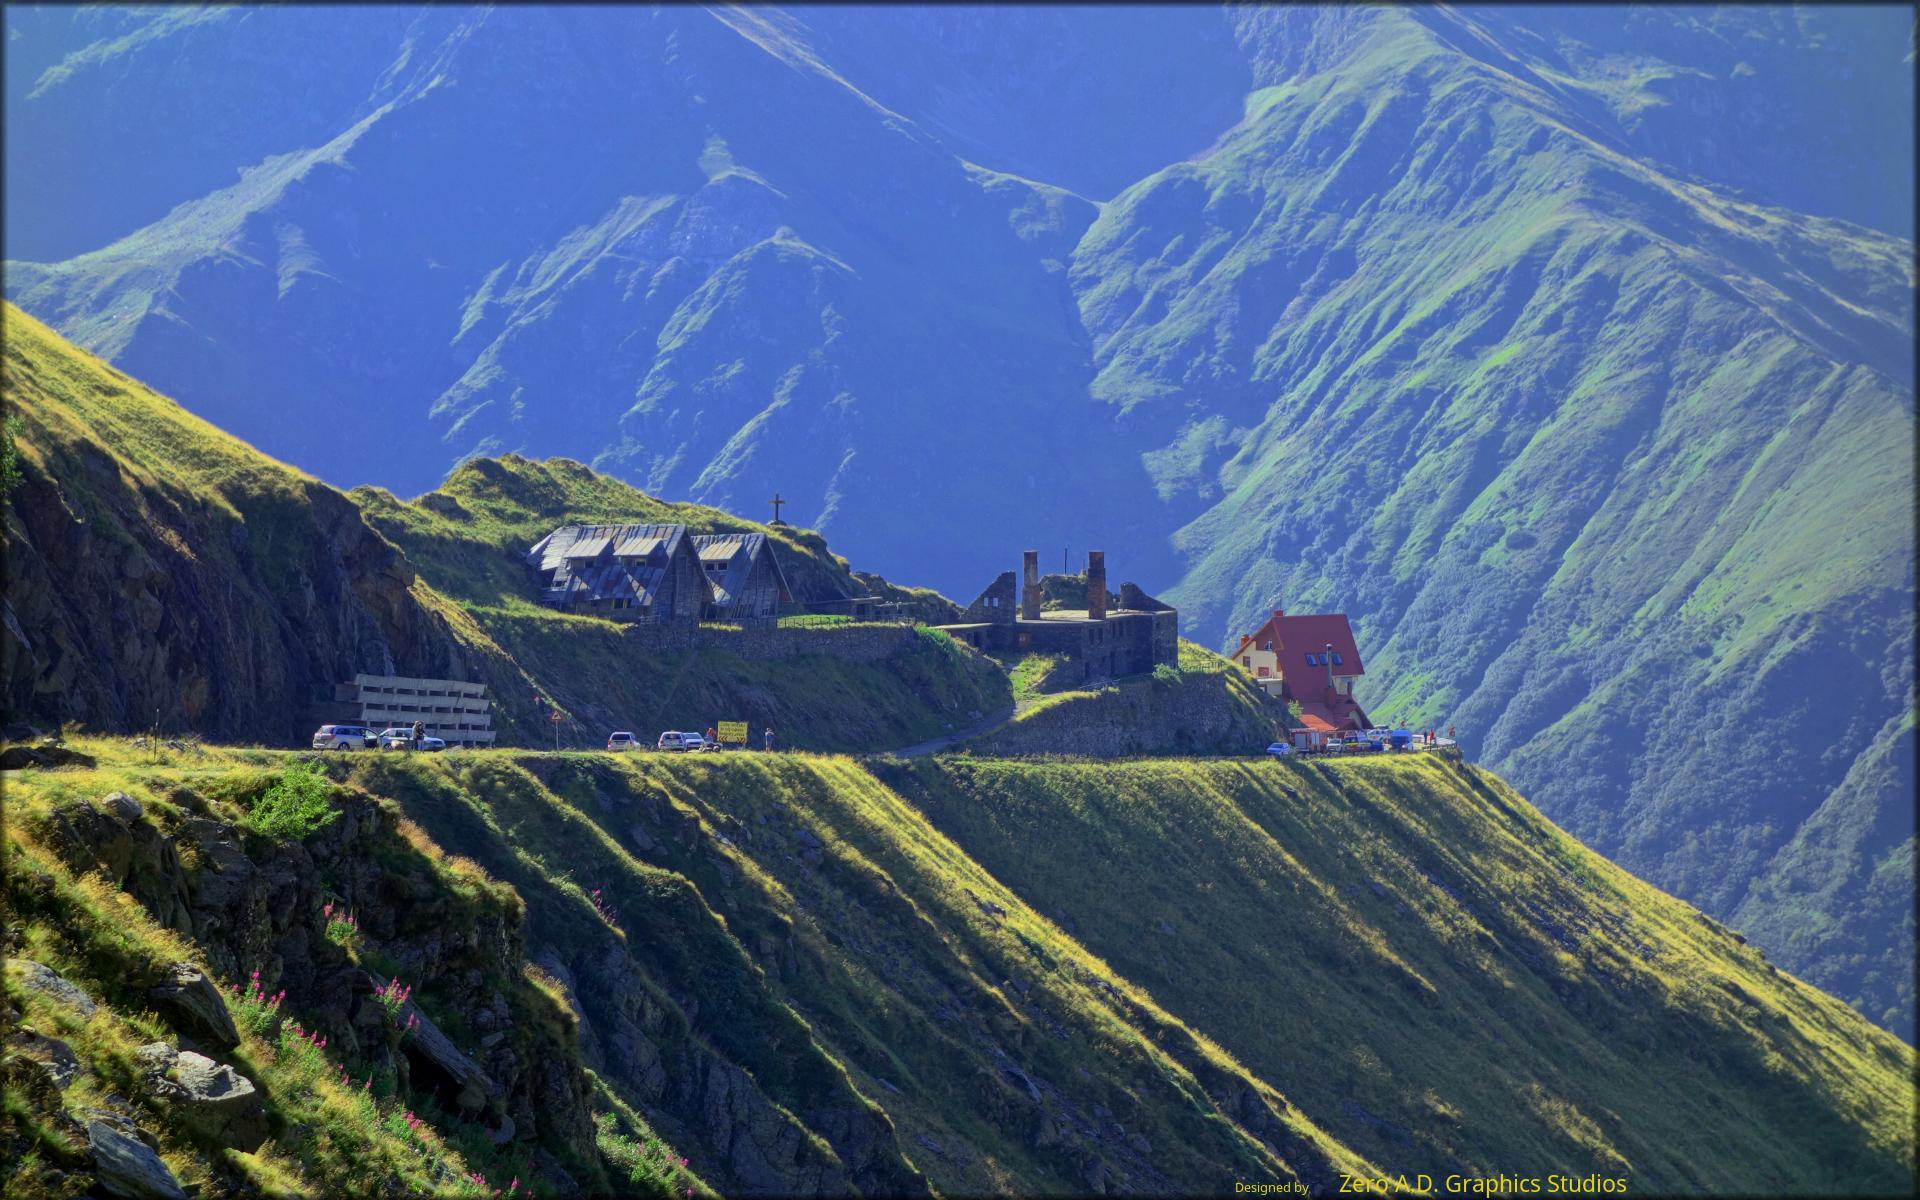 TransFagarasan Highway - Sibiu County tour | Medieval Transylvania